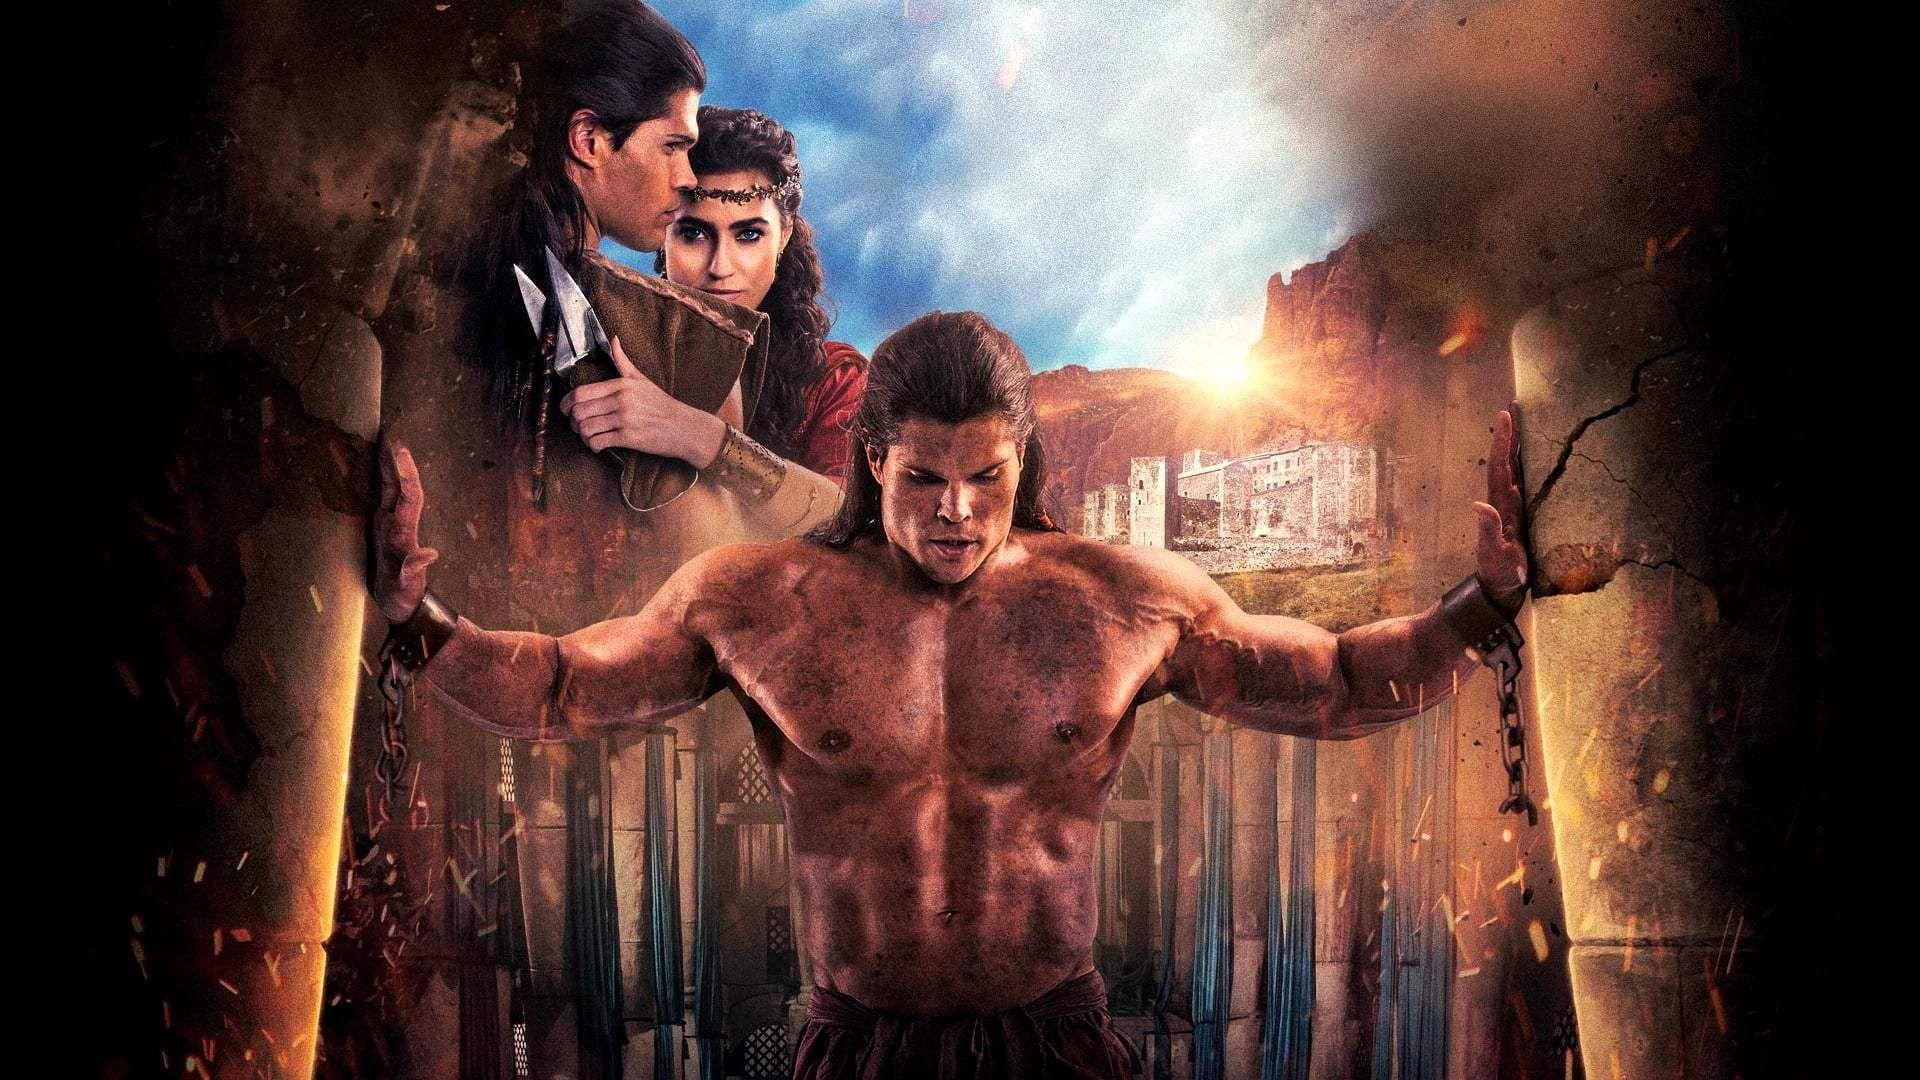 Assistir Samson Filme Completo Dublado Legendado Portugues Kinopalasti Free Movies Online Movies Full Movies Online Free